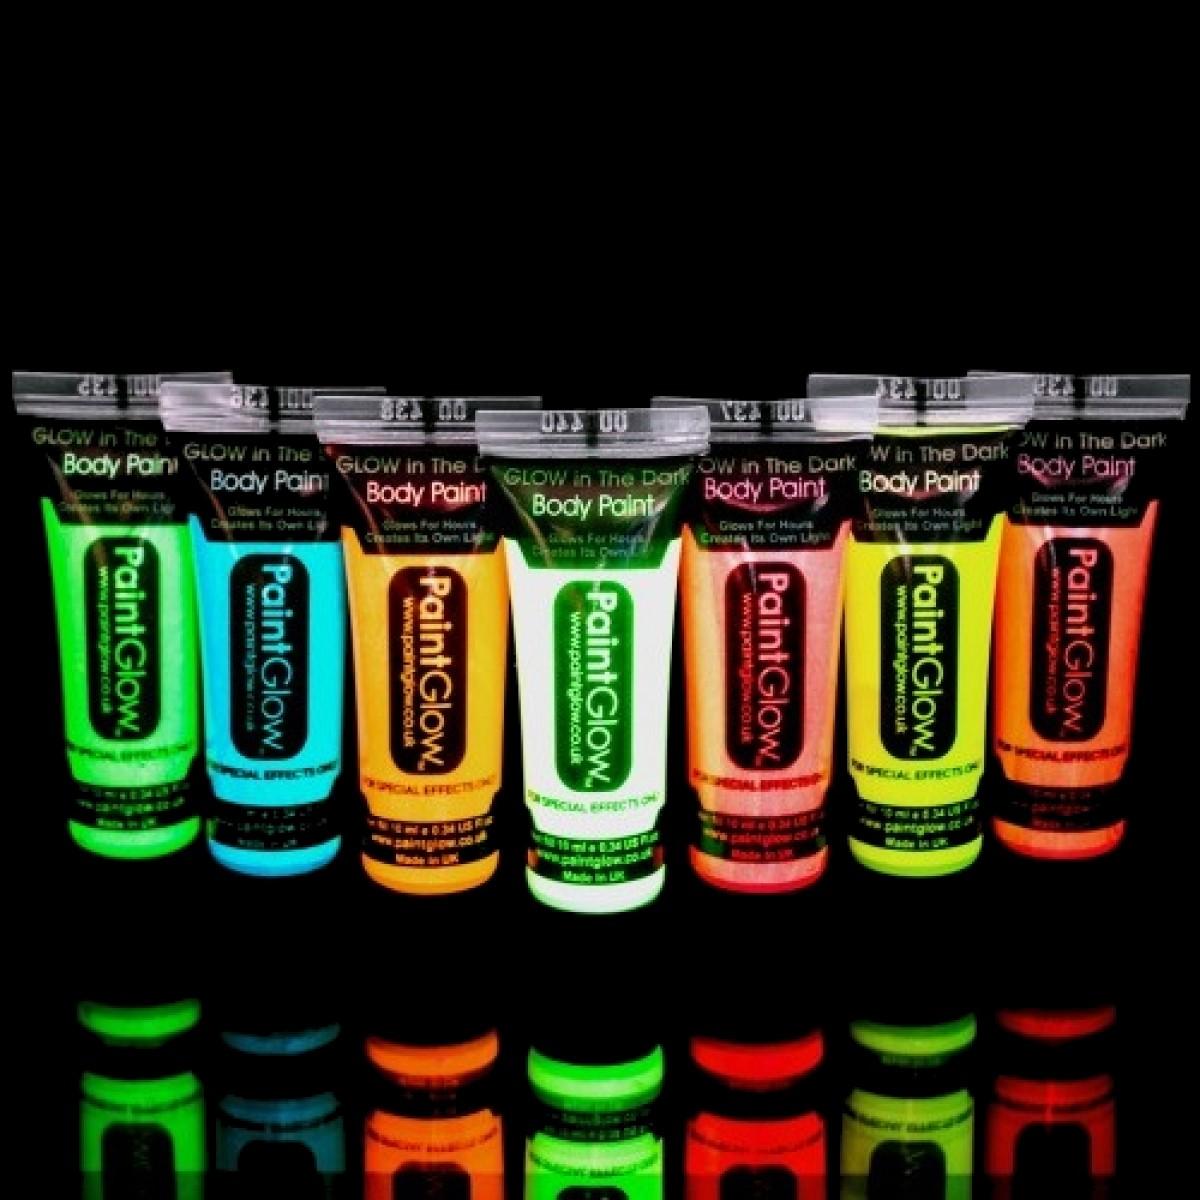 Fosforova Barva Na Telo A Oblicej 10ml Bodypainting Lightstick Cz